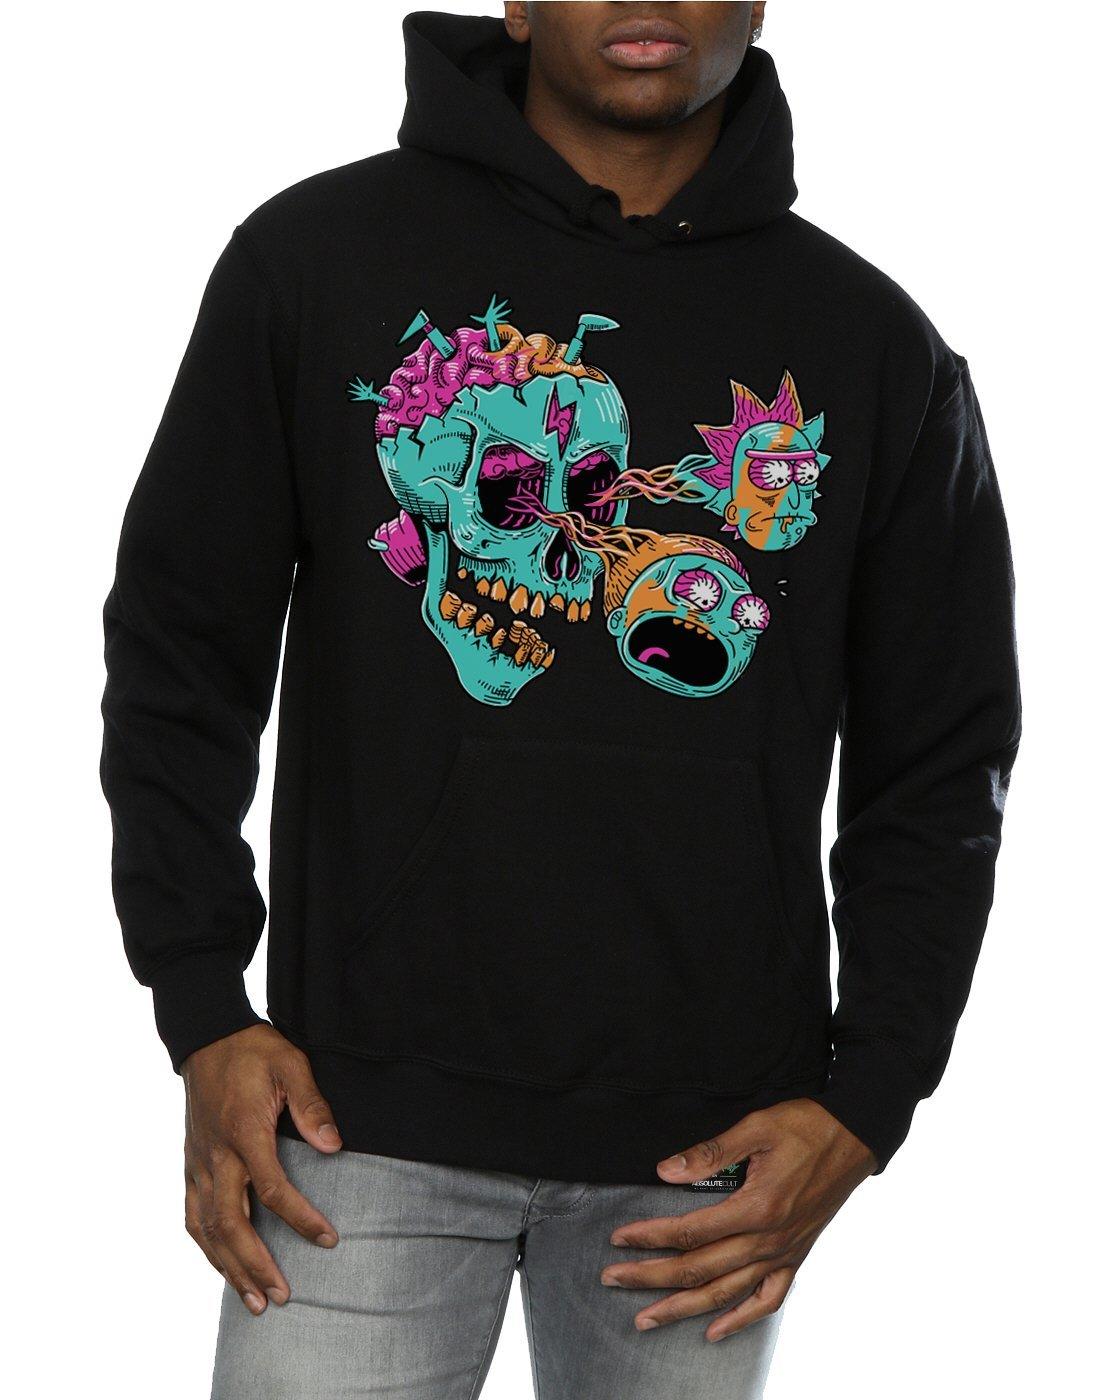 Rick and Morty: Eyeball Skull Hoodie (X-Large) image